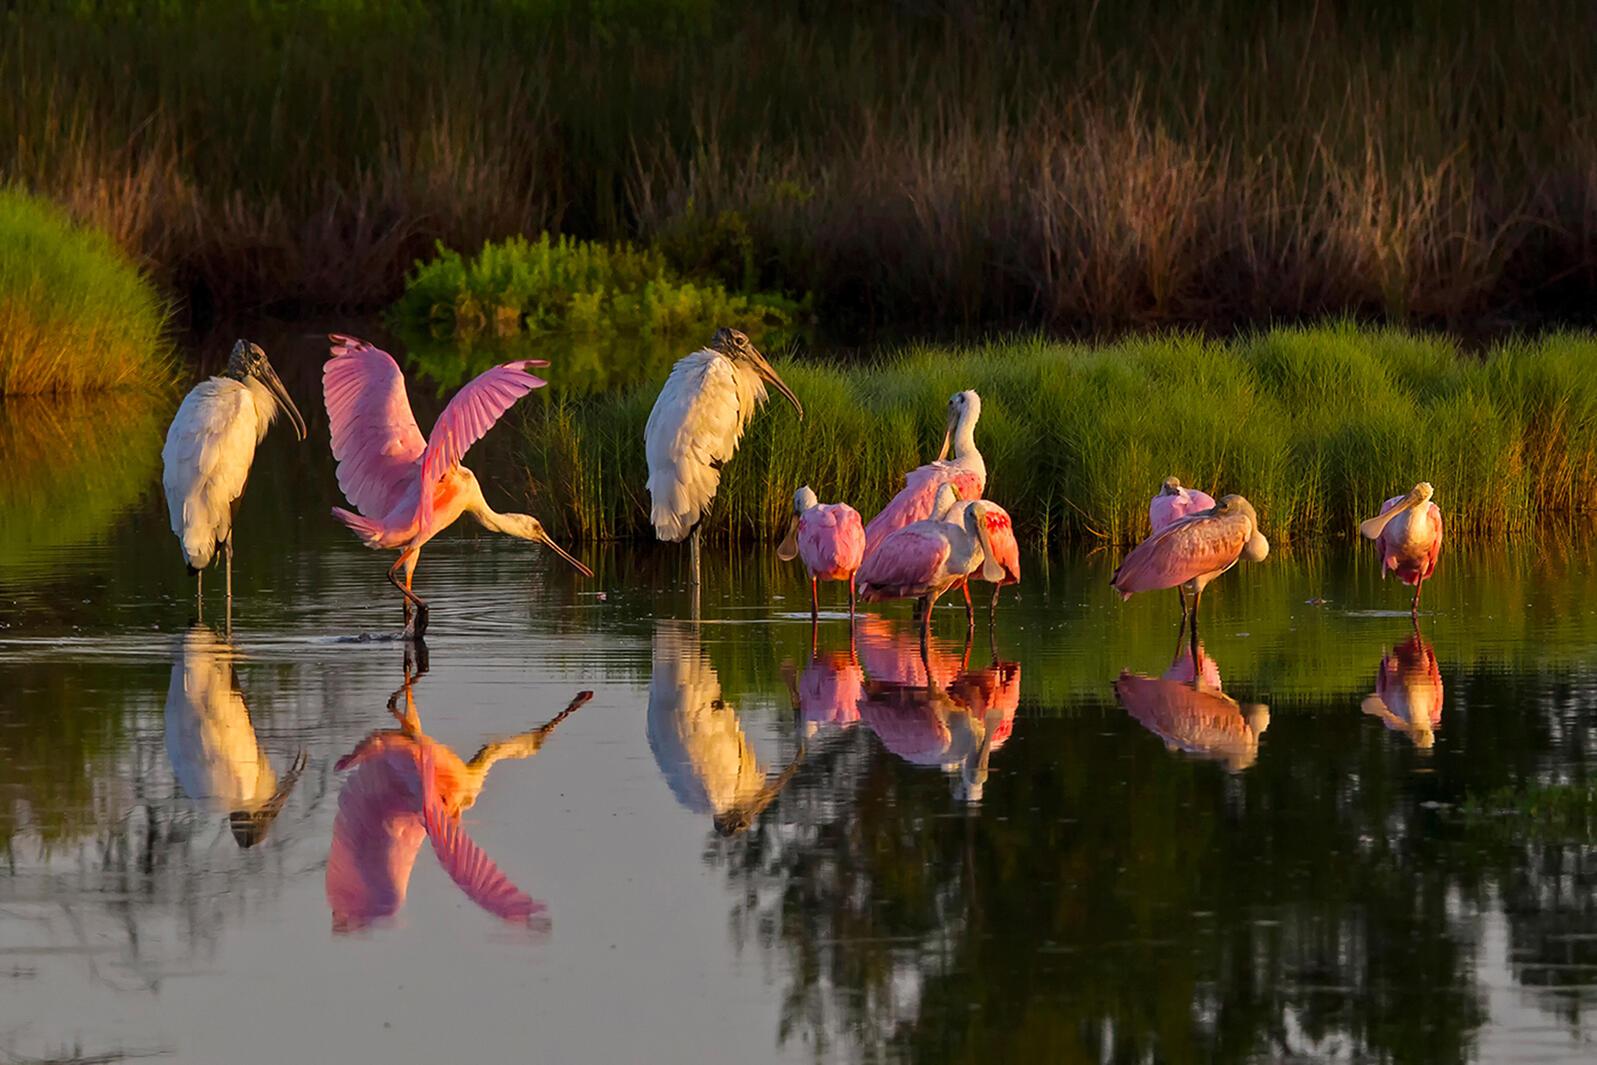 Roseate Spoonbills and Wood Storks